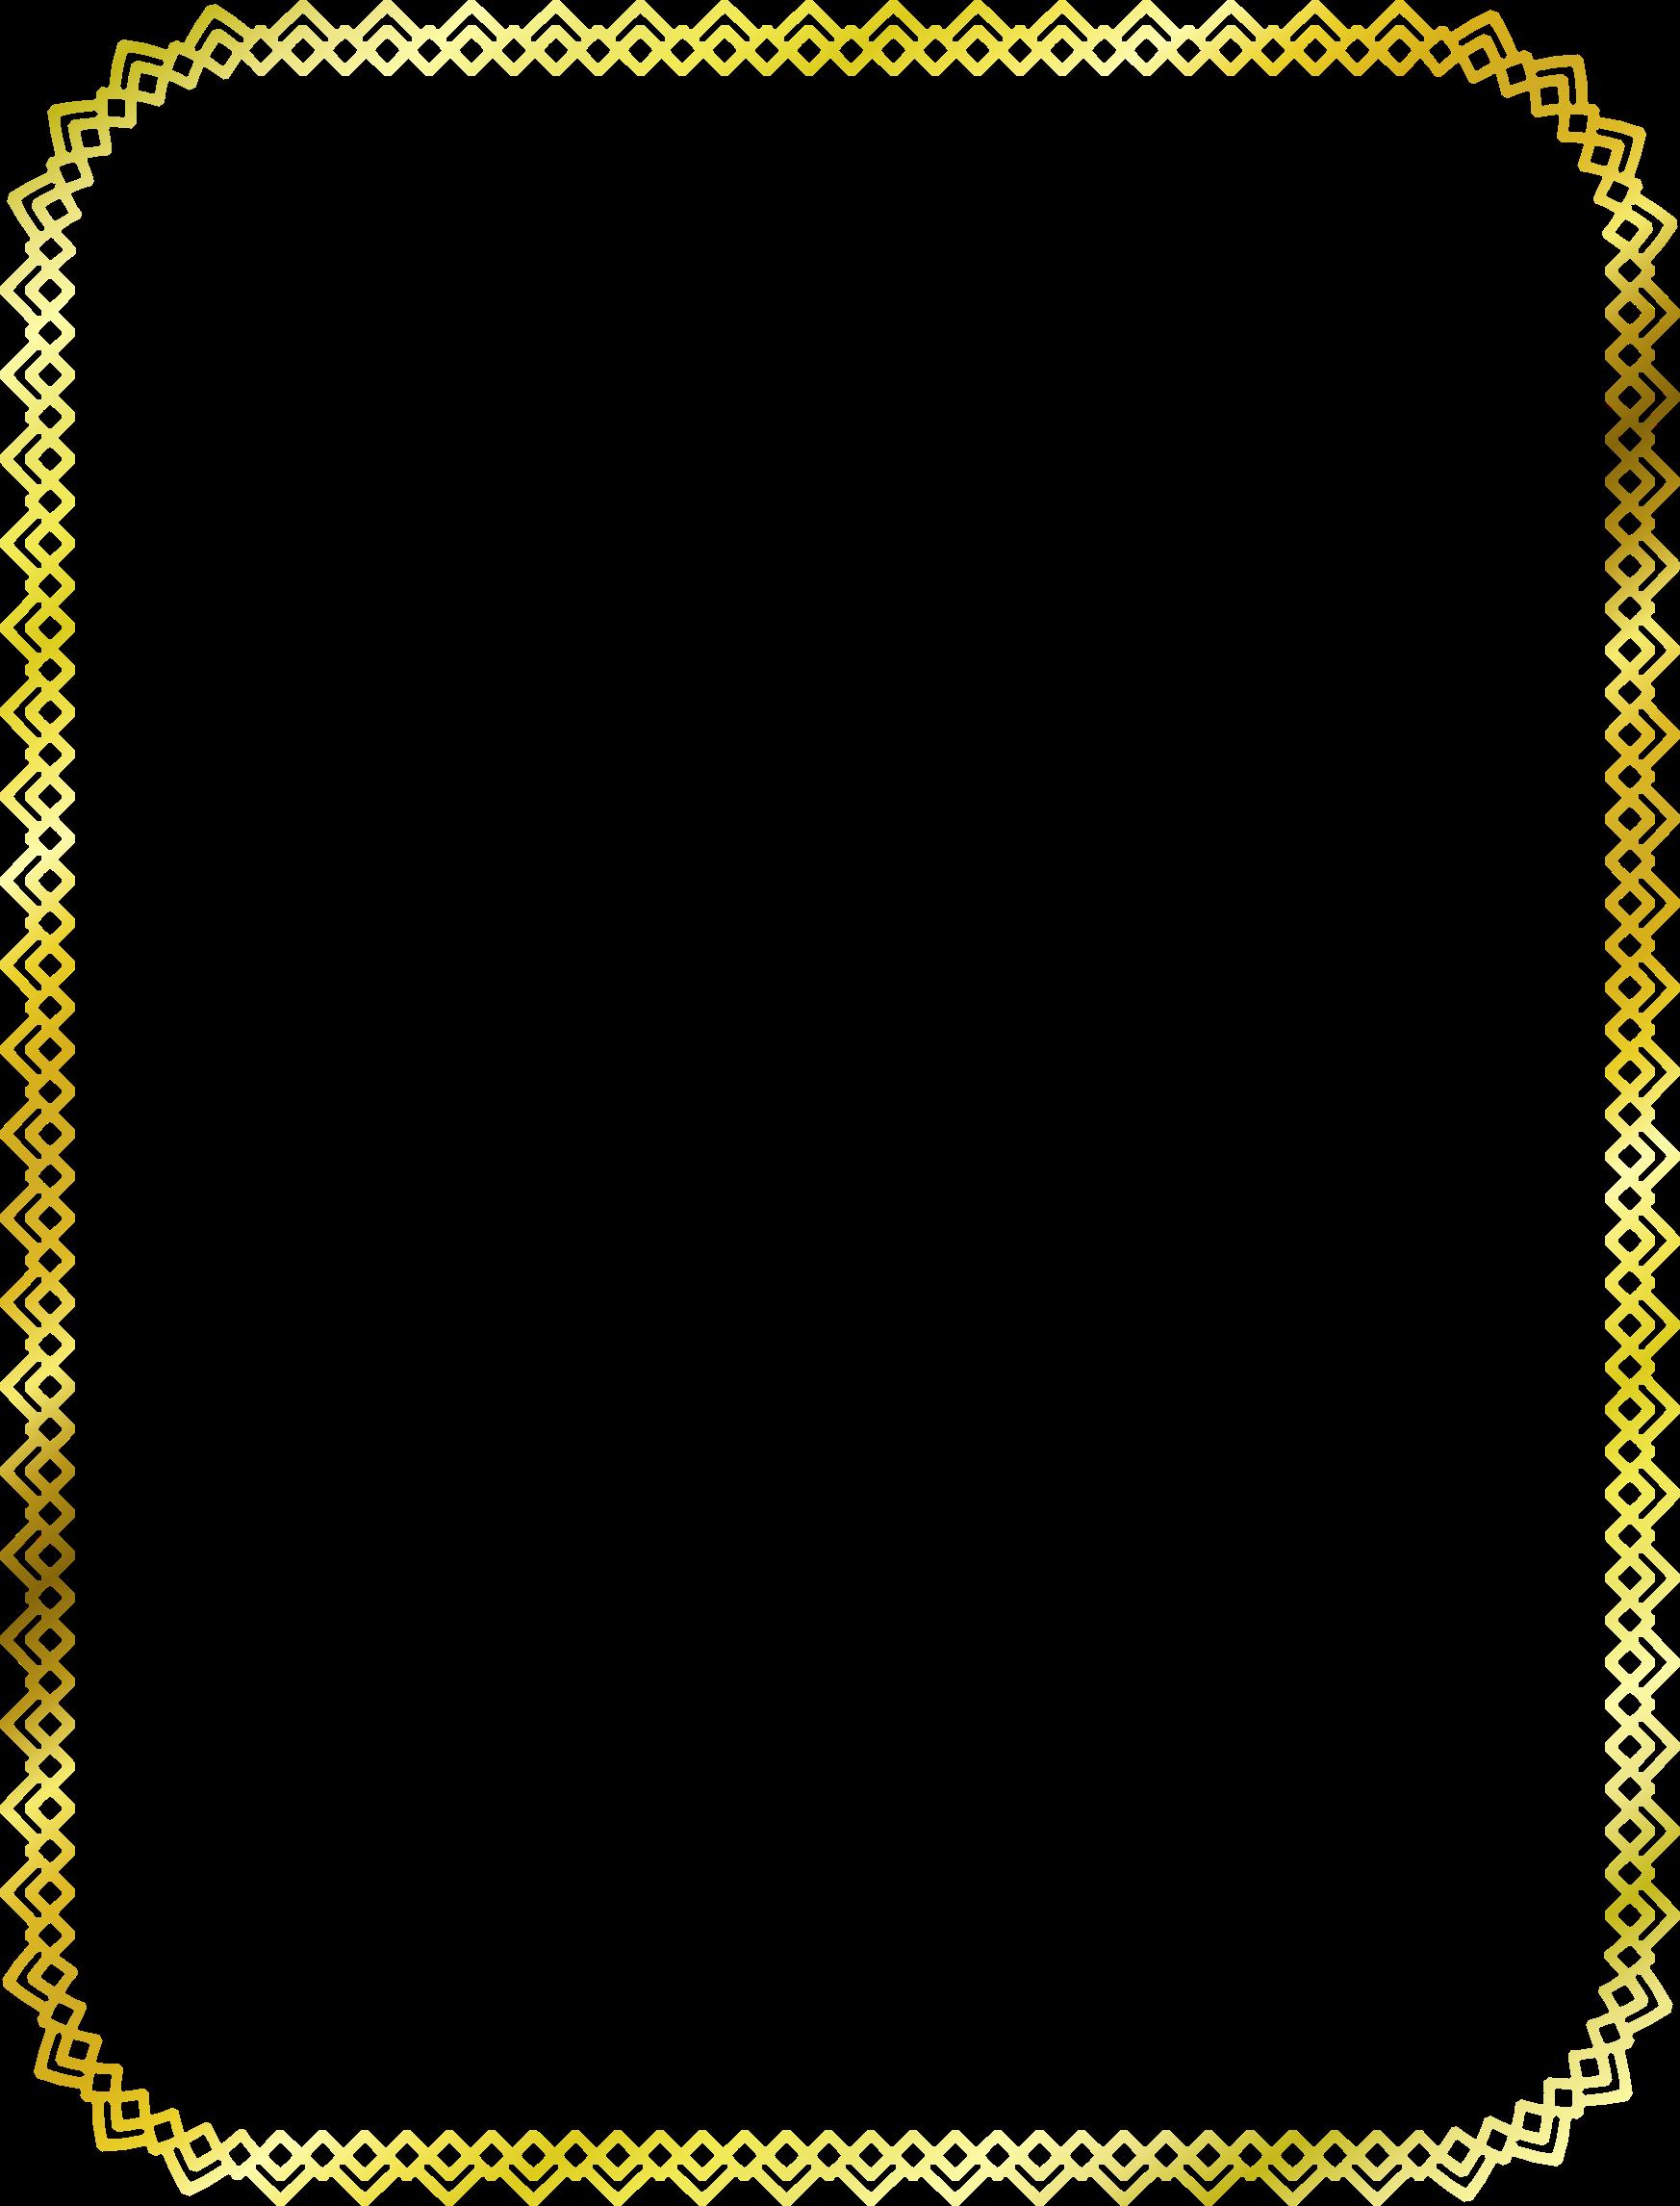 Clipart quadrilateral big image. Diamond border png